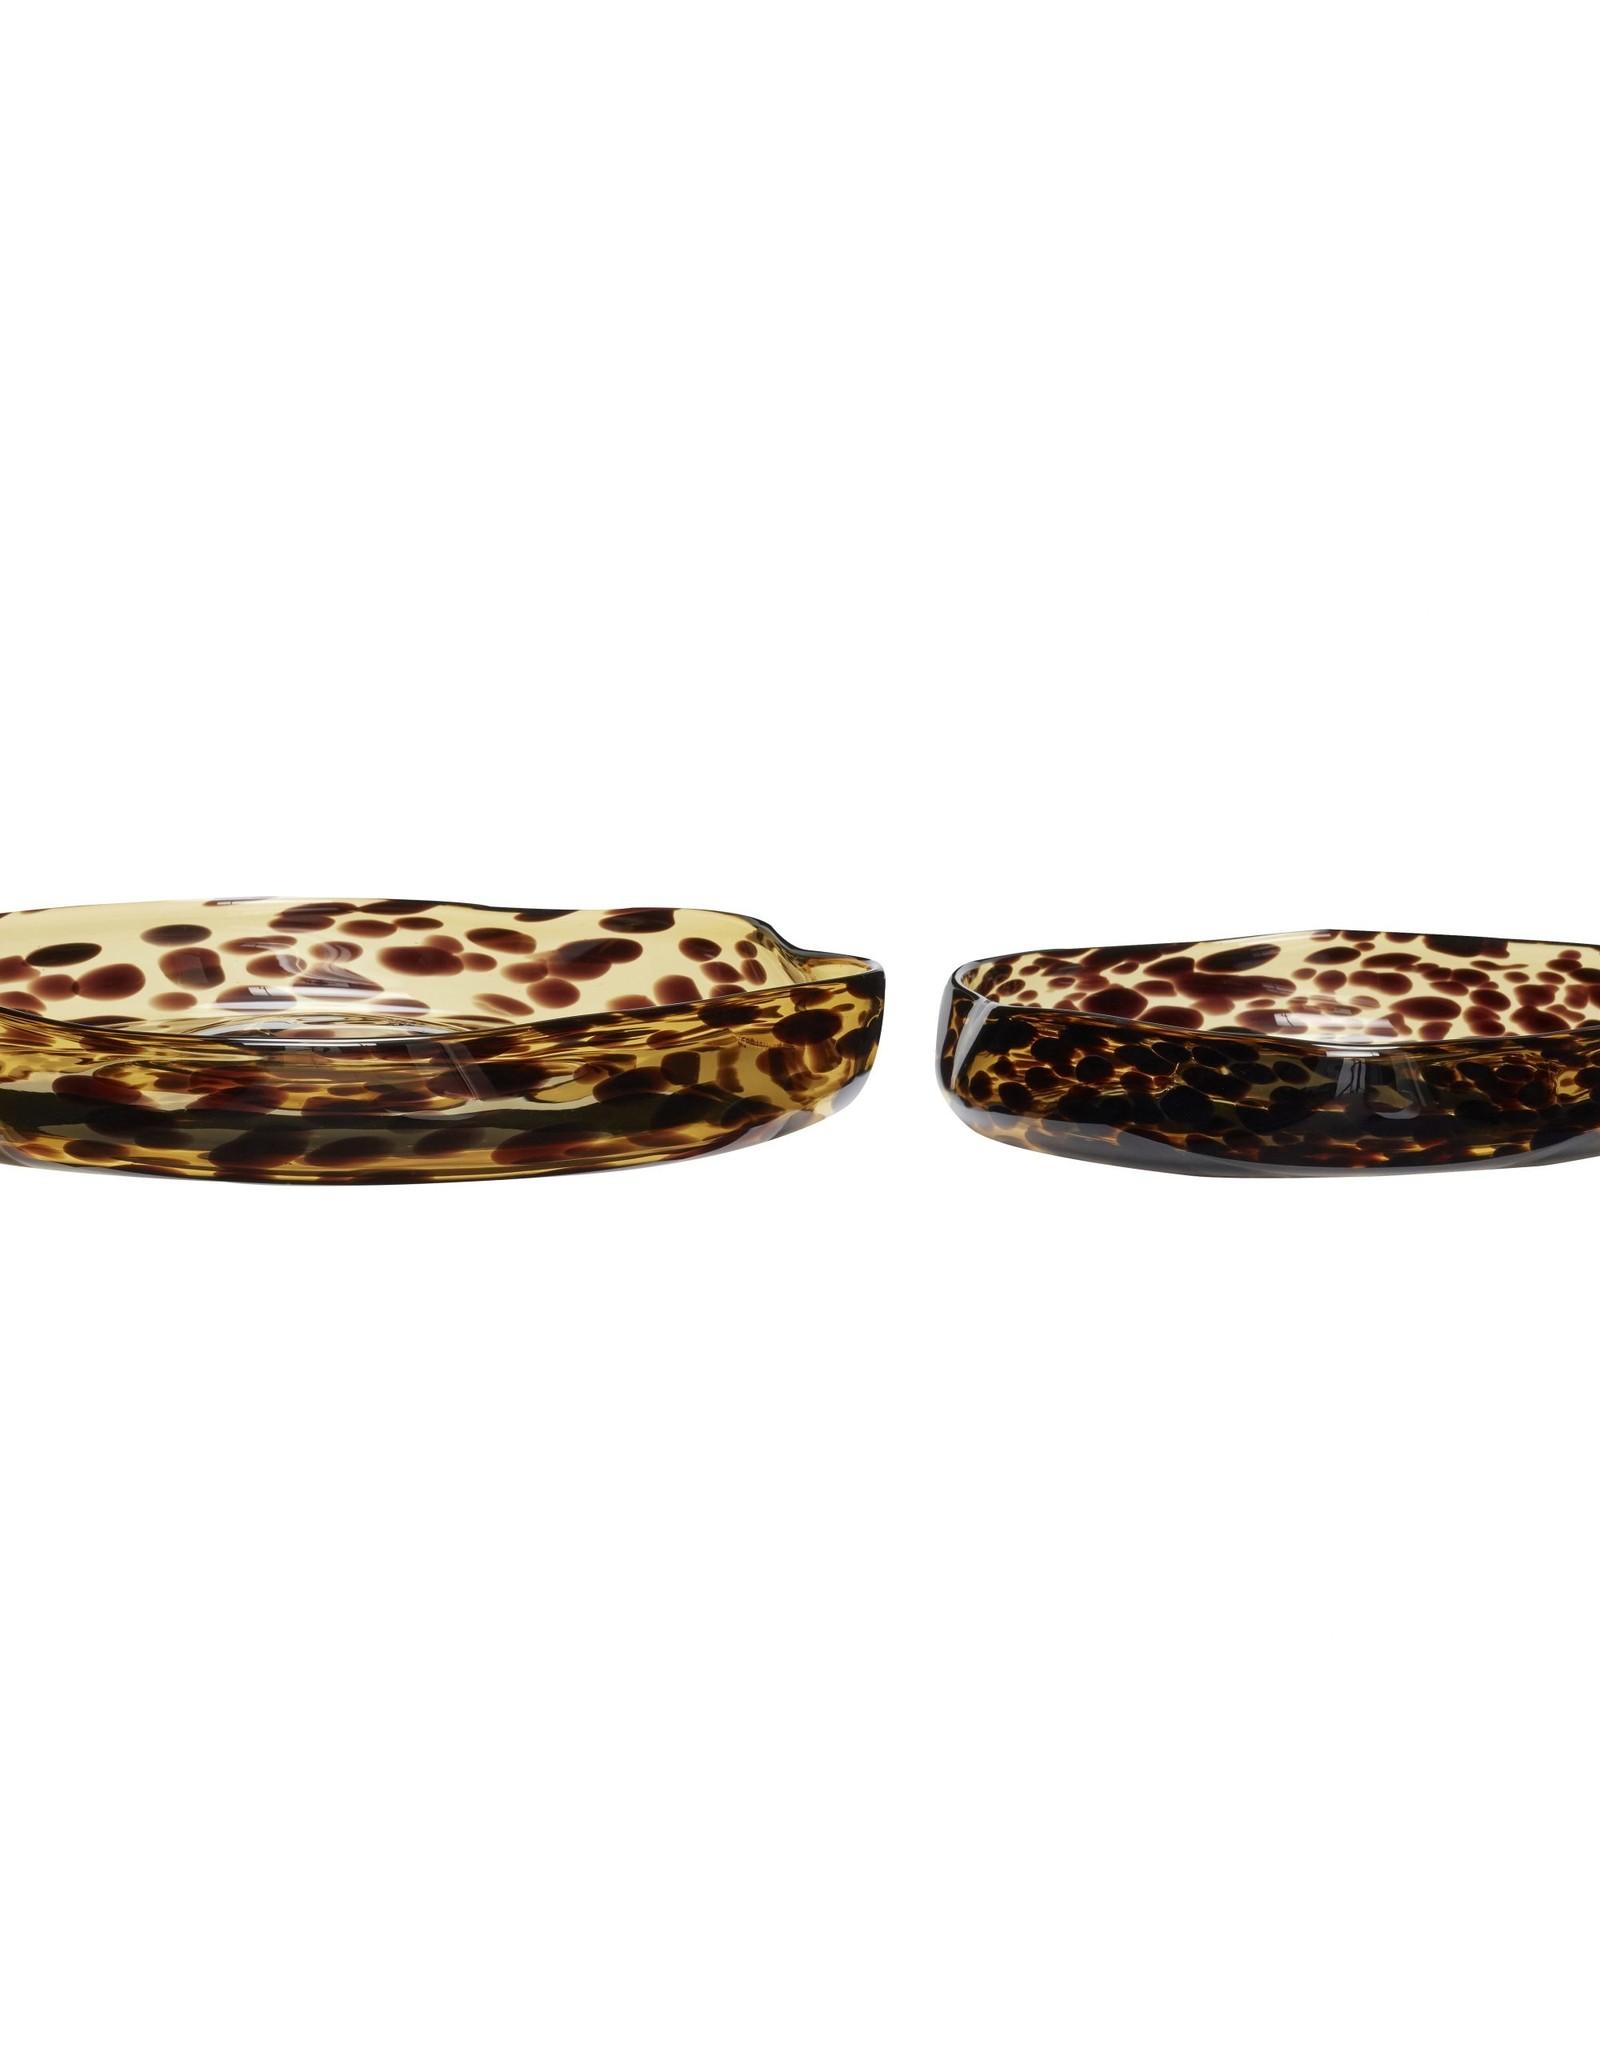 Hübsch Tray yellow brown (set of 2)